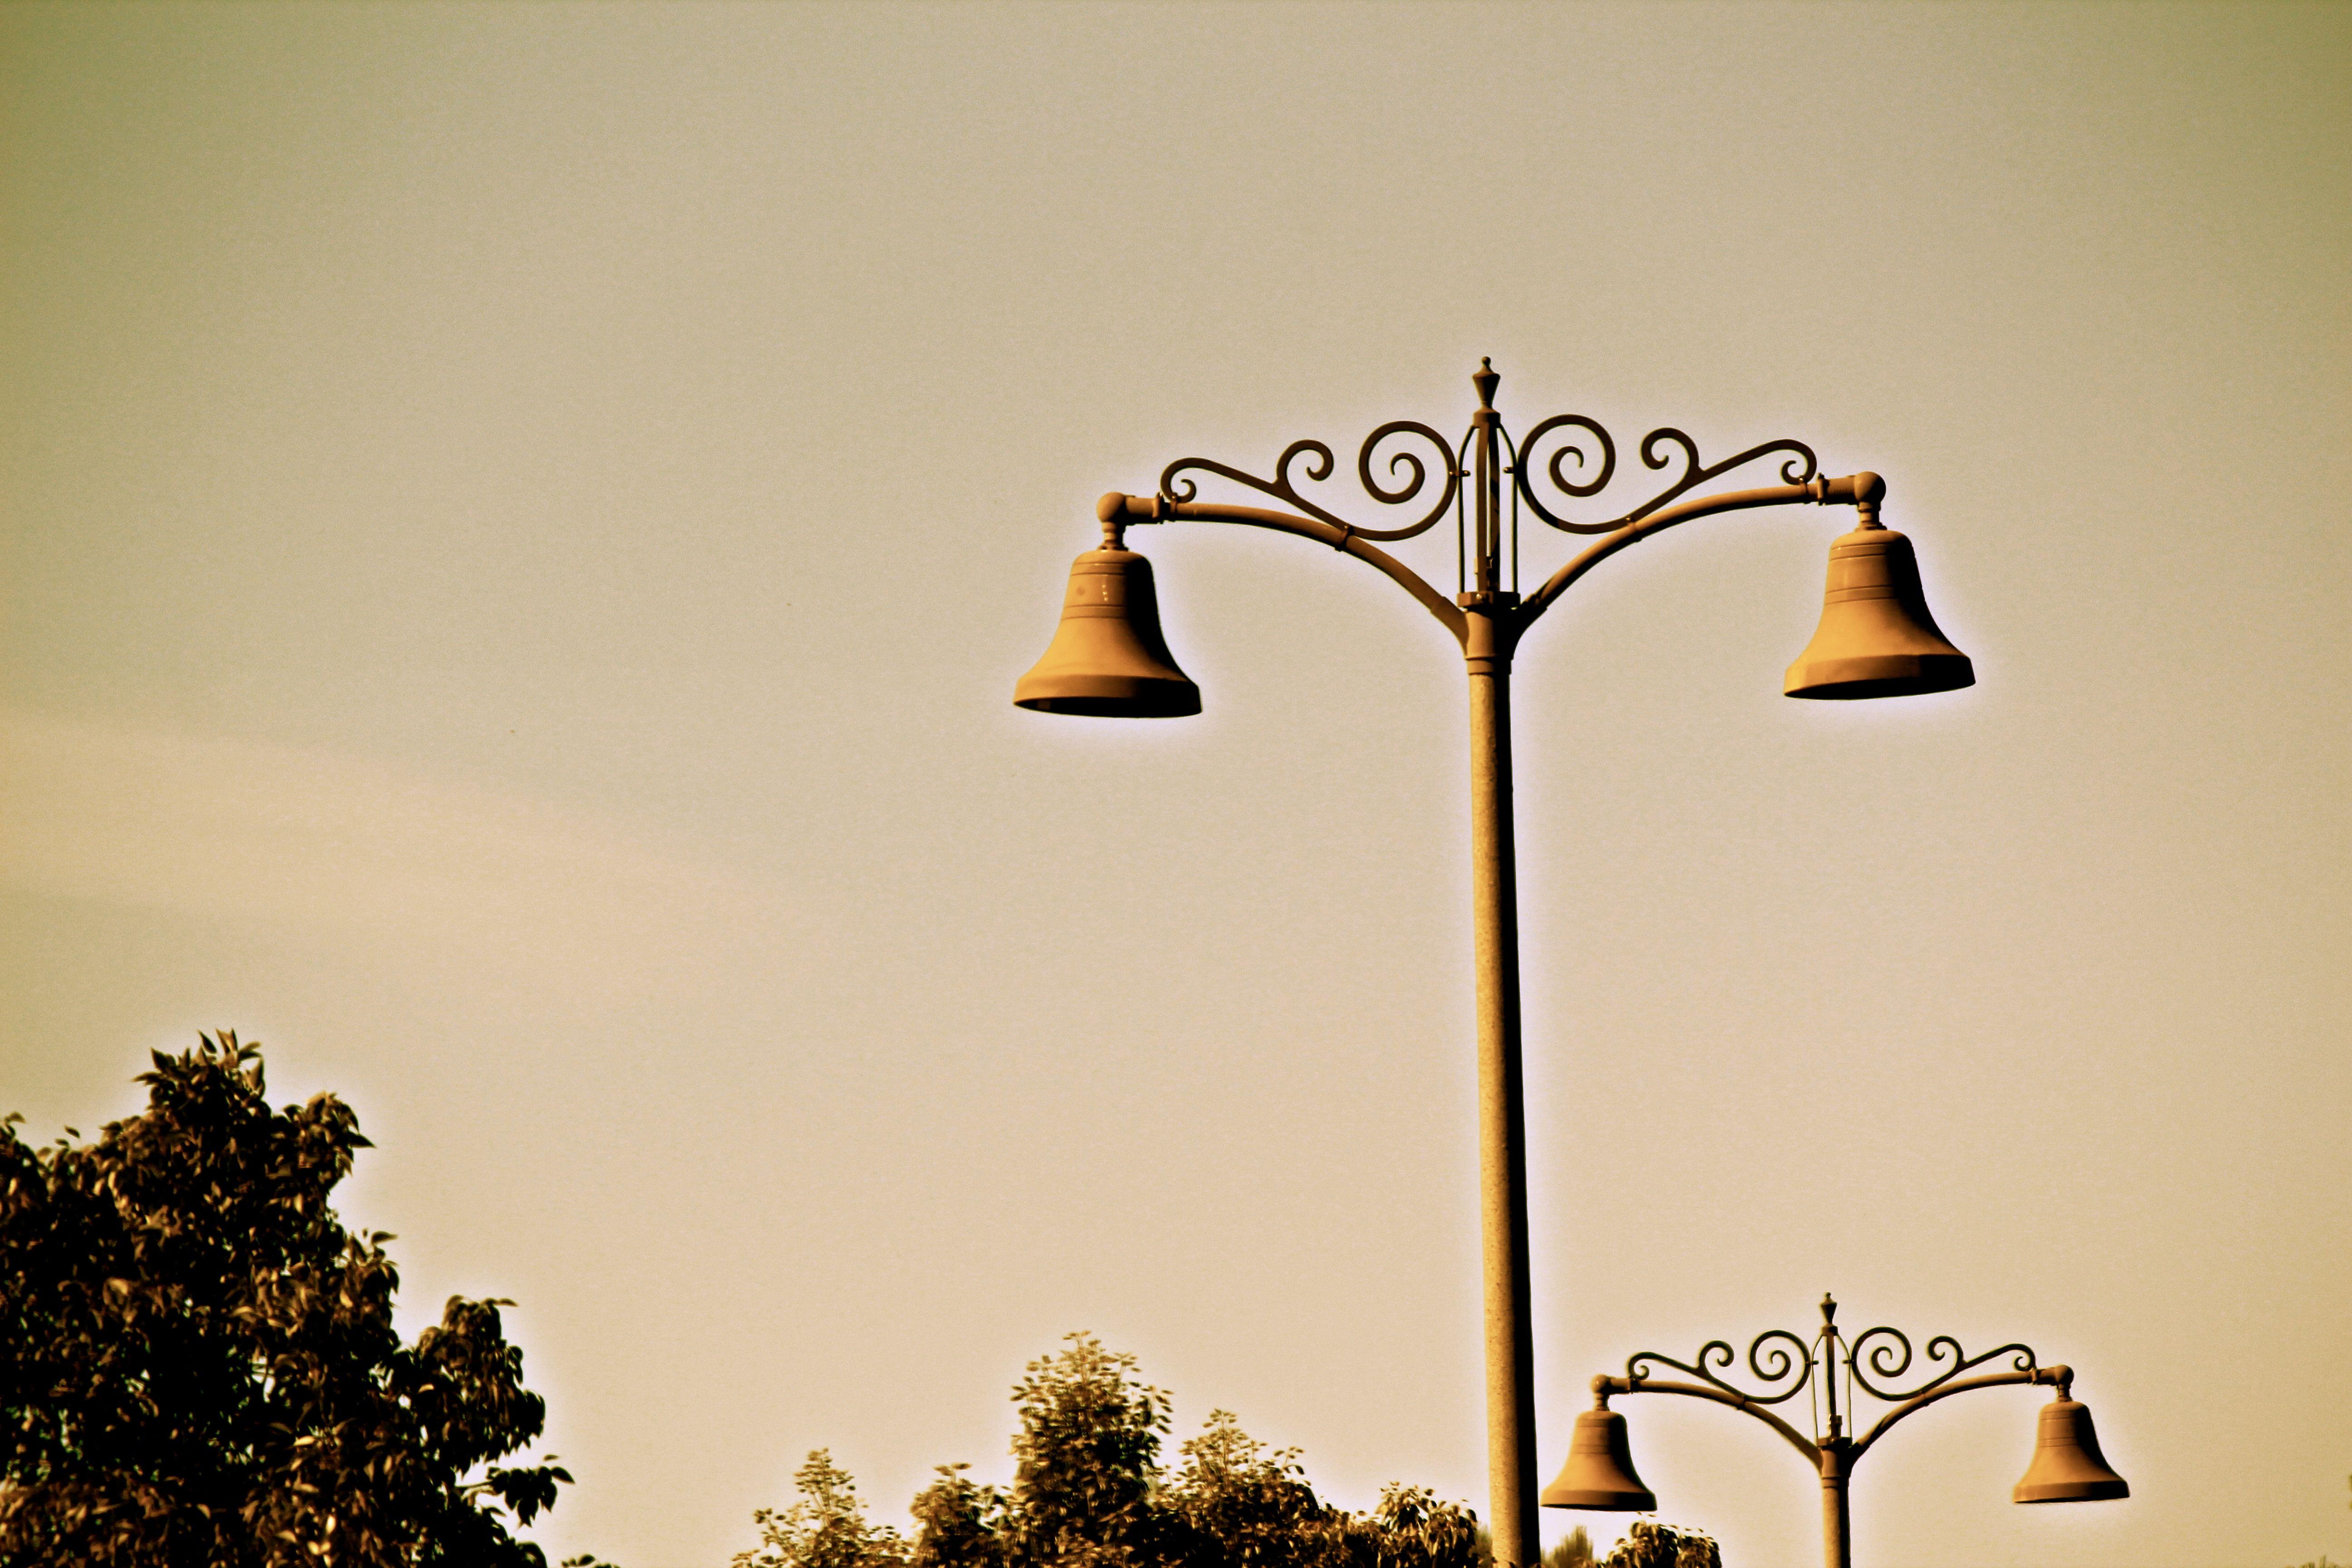 Table lamp, Lighting, Home decor